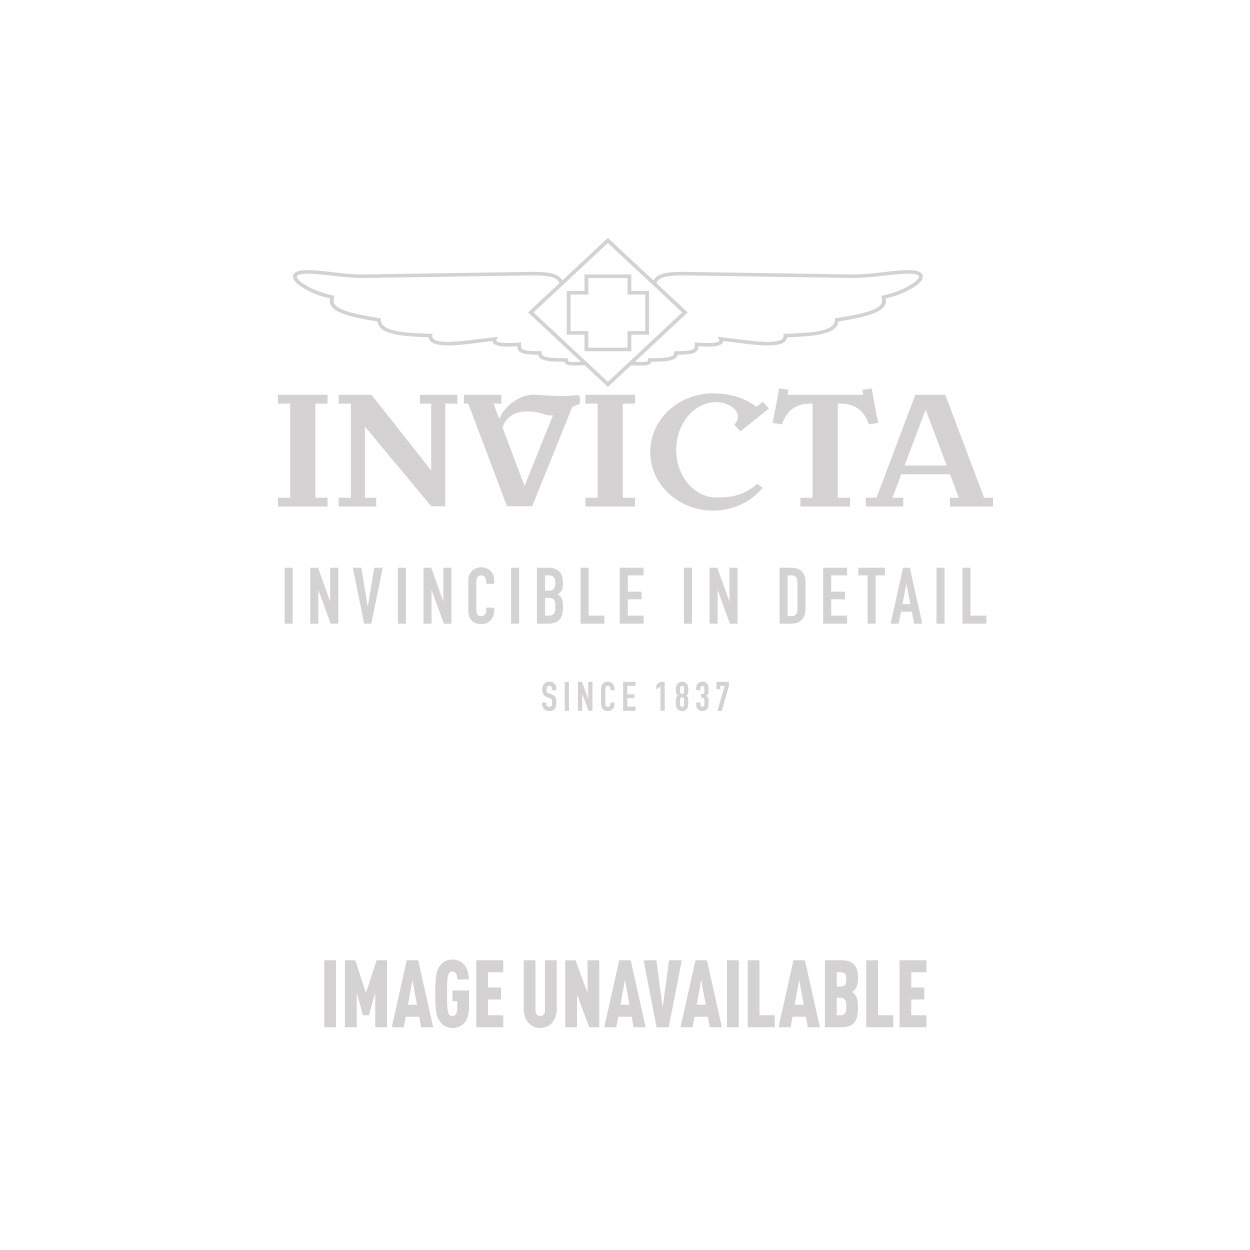 Invicta Corduba Swiss Movement Quartz Watch - Stainless Steel case Stainless Steel band - Model 17097